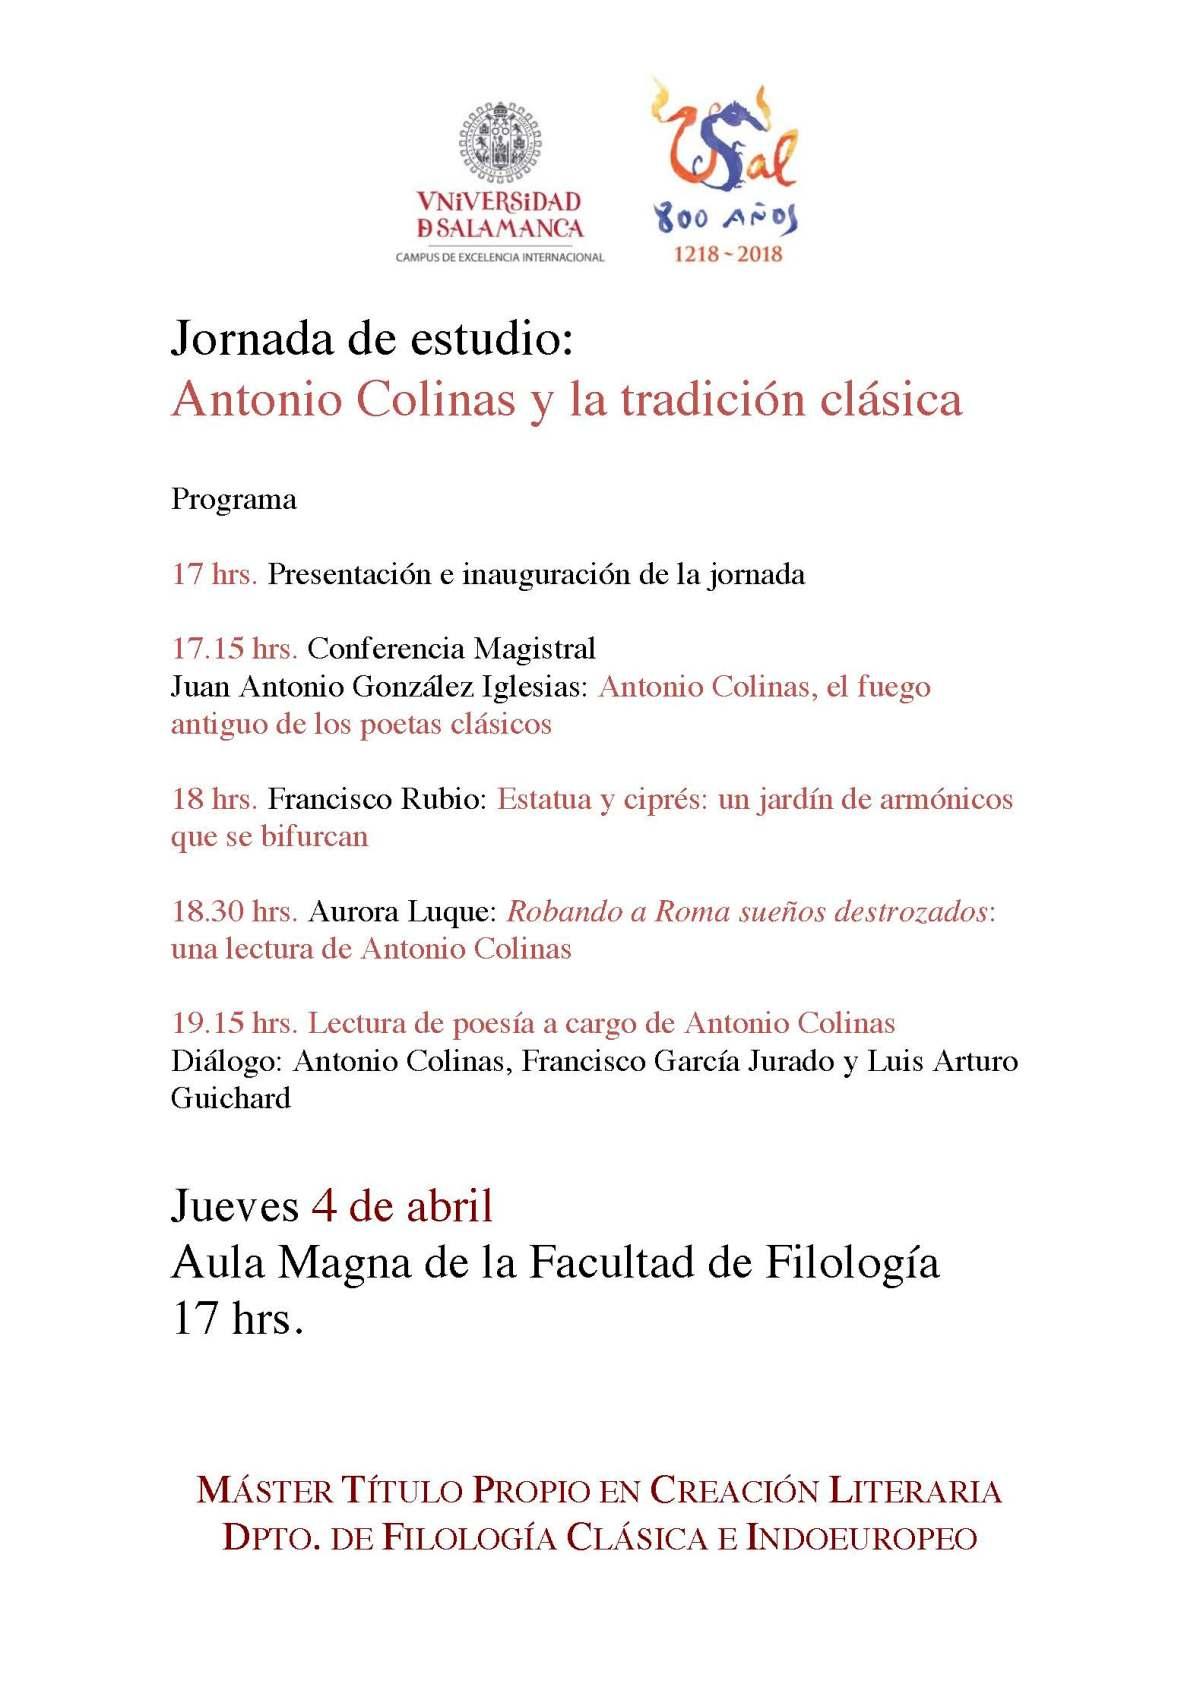 Programa Colinas 01-1